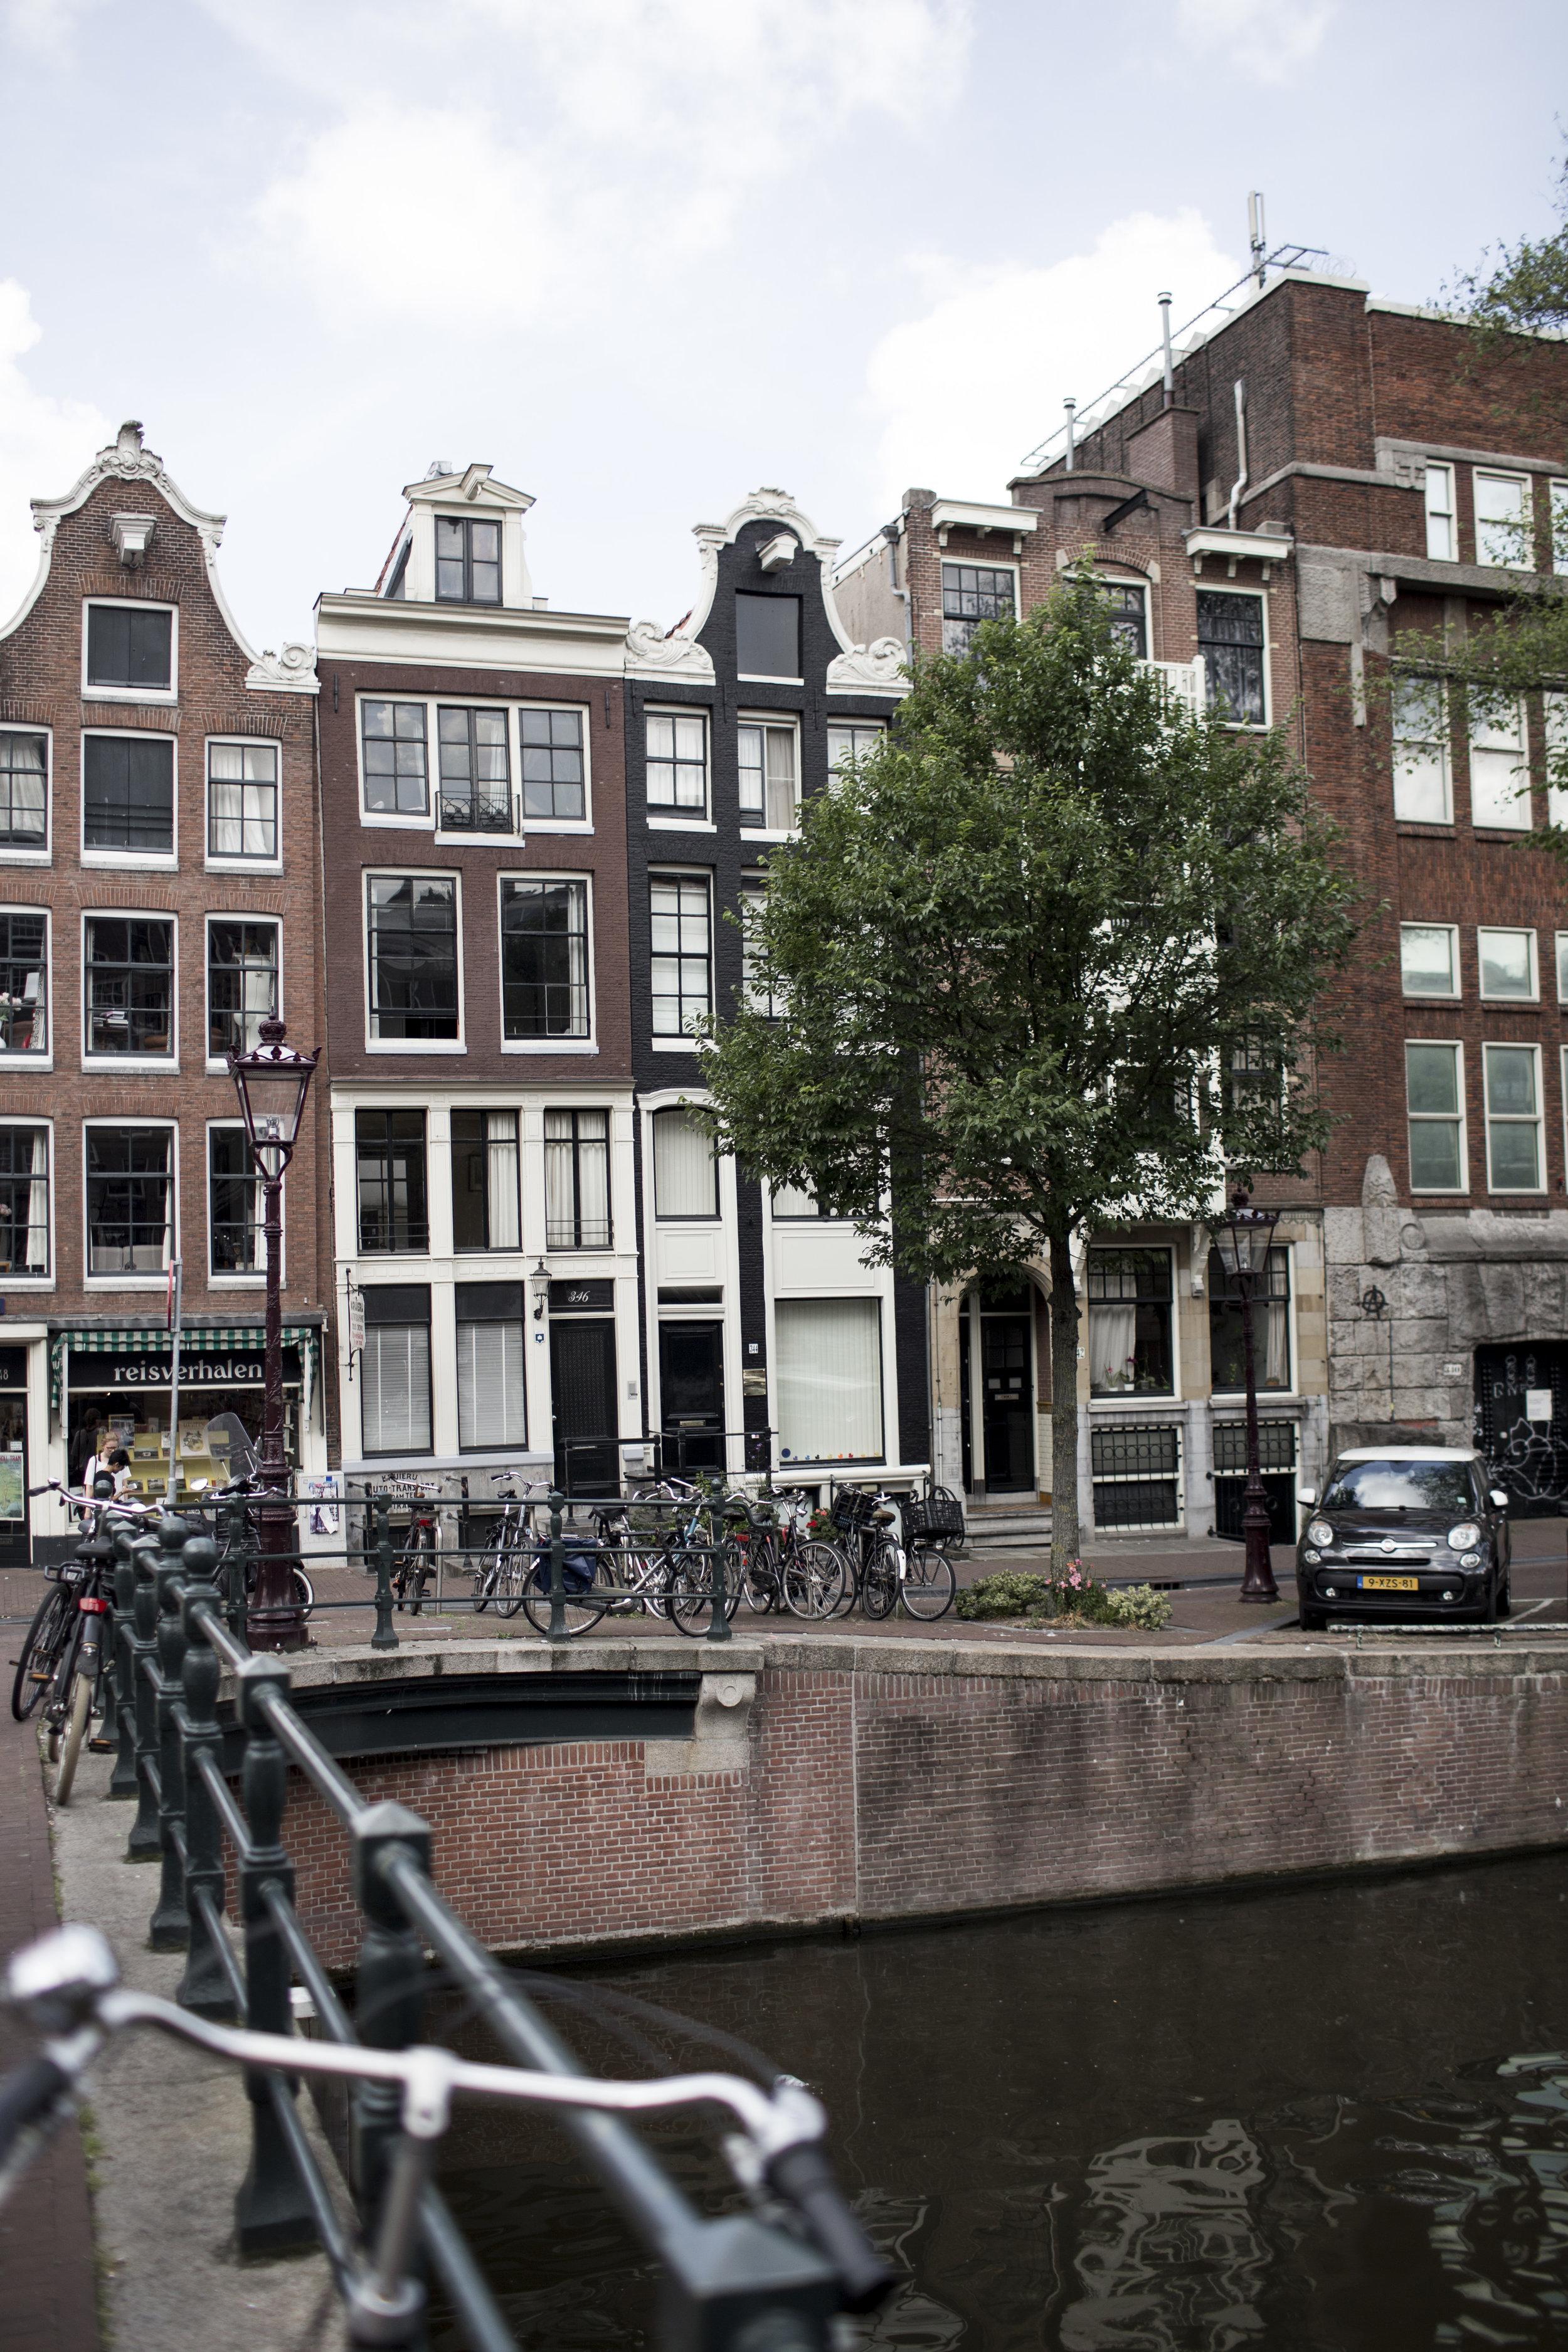 Jordan_Bunker_three_days_in_amsterdam_46.jpg